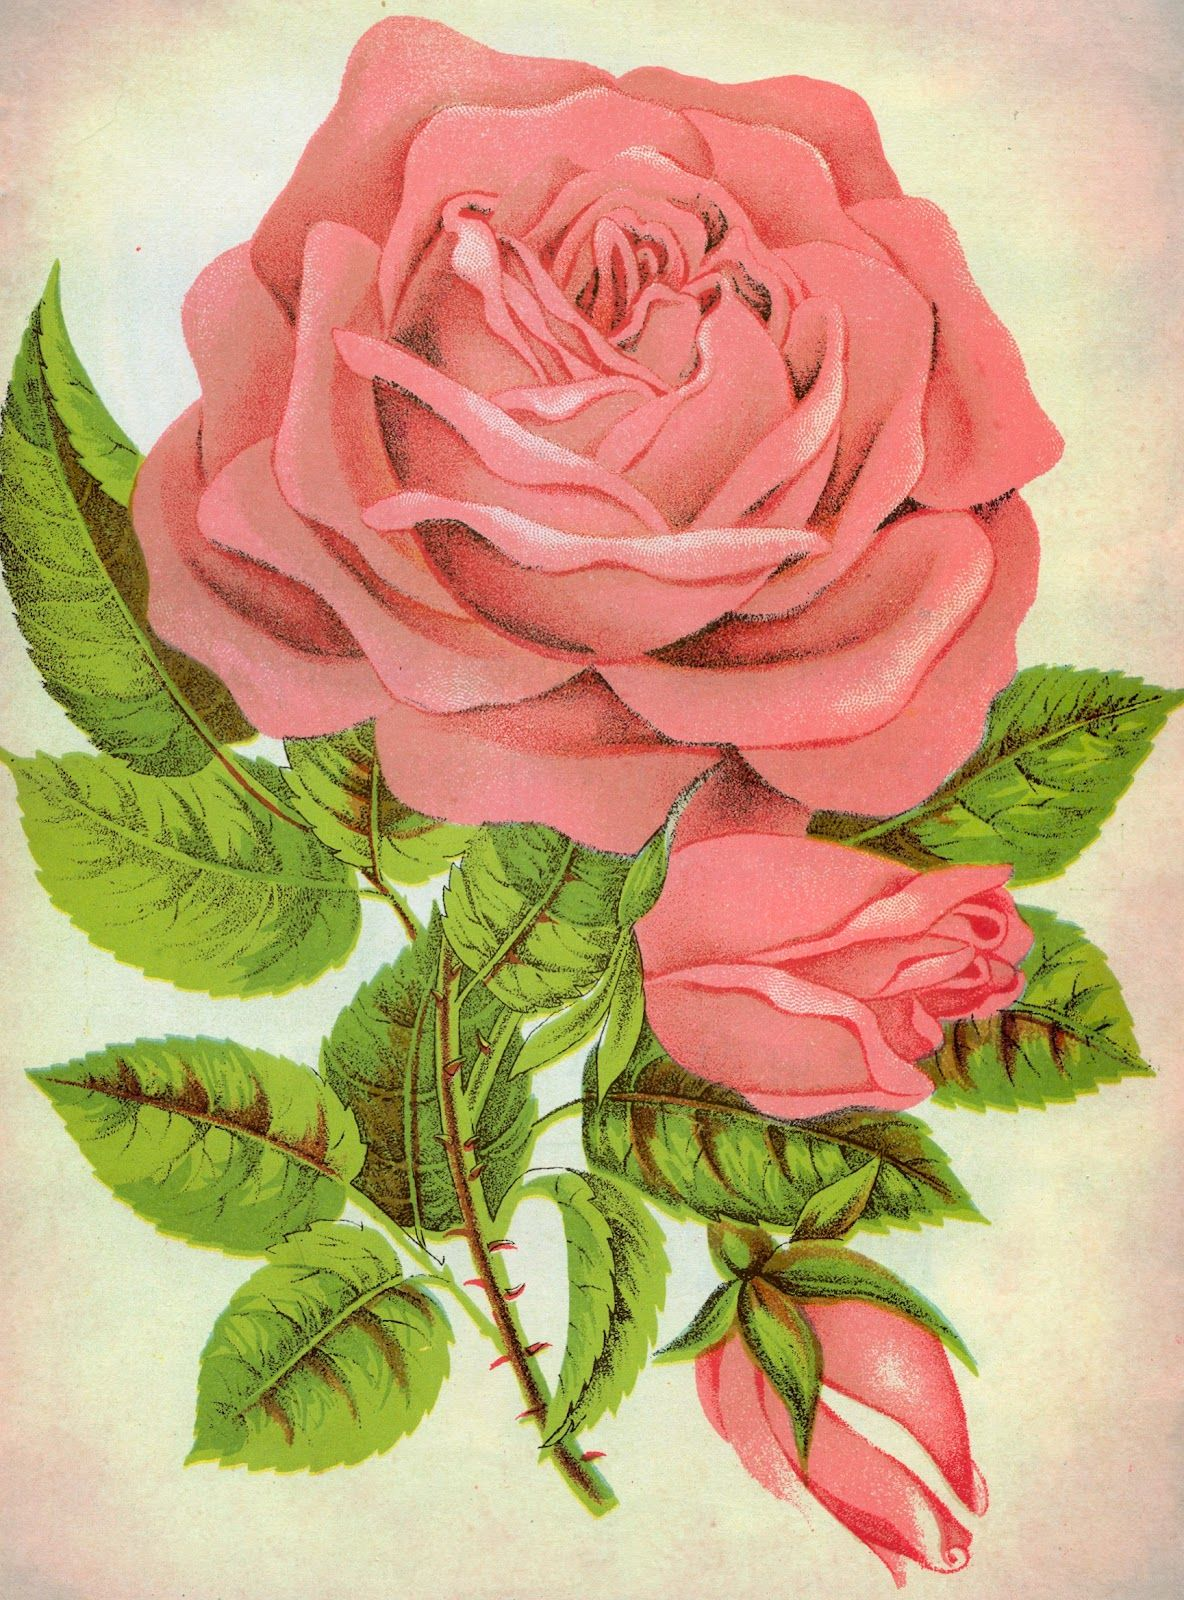 Antique Images Free Rose Graphic Botanical Illustration Of Pink